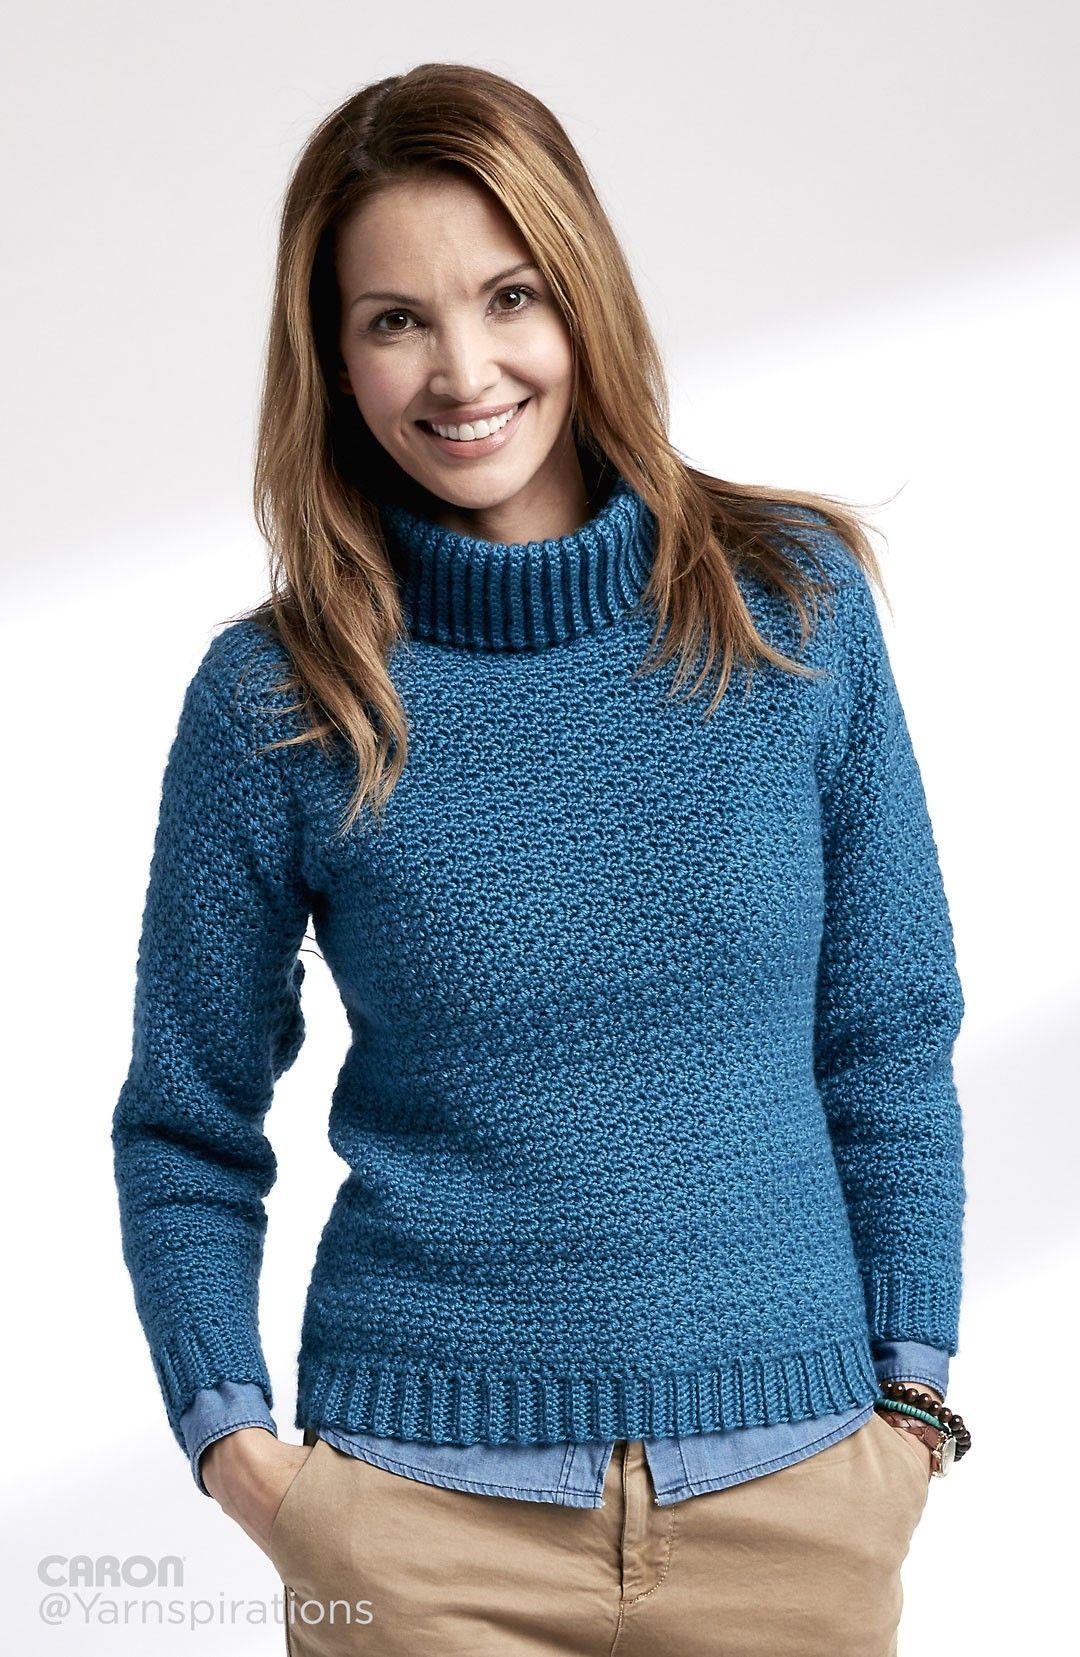 Adult Crochet Turtleneck Pullover Free Crochet Pattern